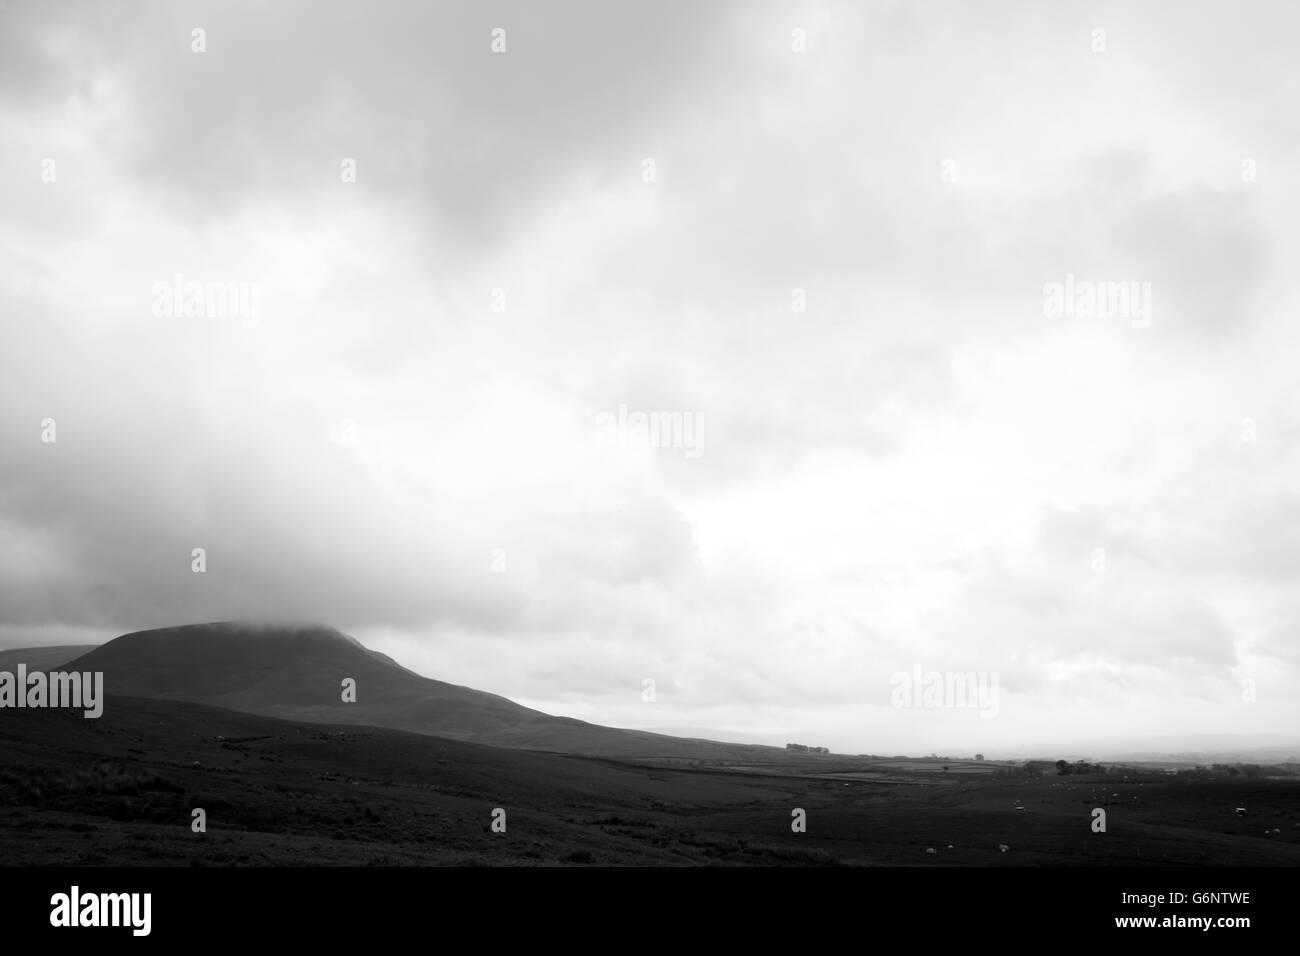 Roman Fell, Eden Valley, Cumbria, England, UK - Stock Image